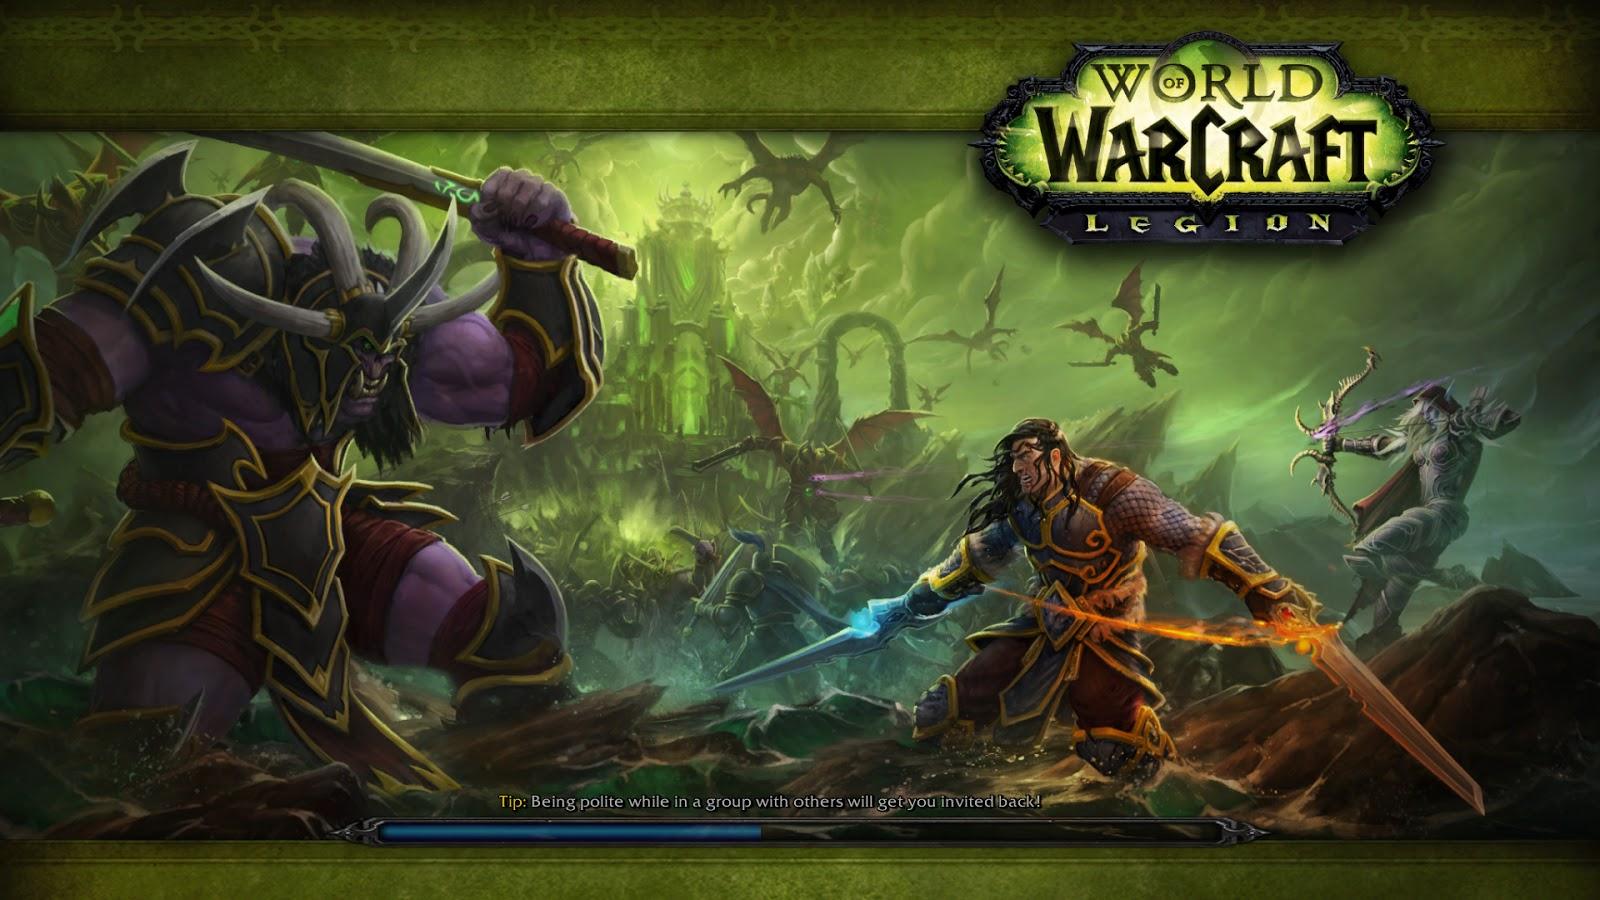 master of world of warcraft legion is just around the corner